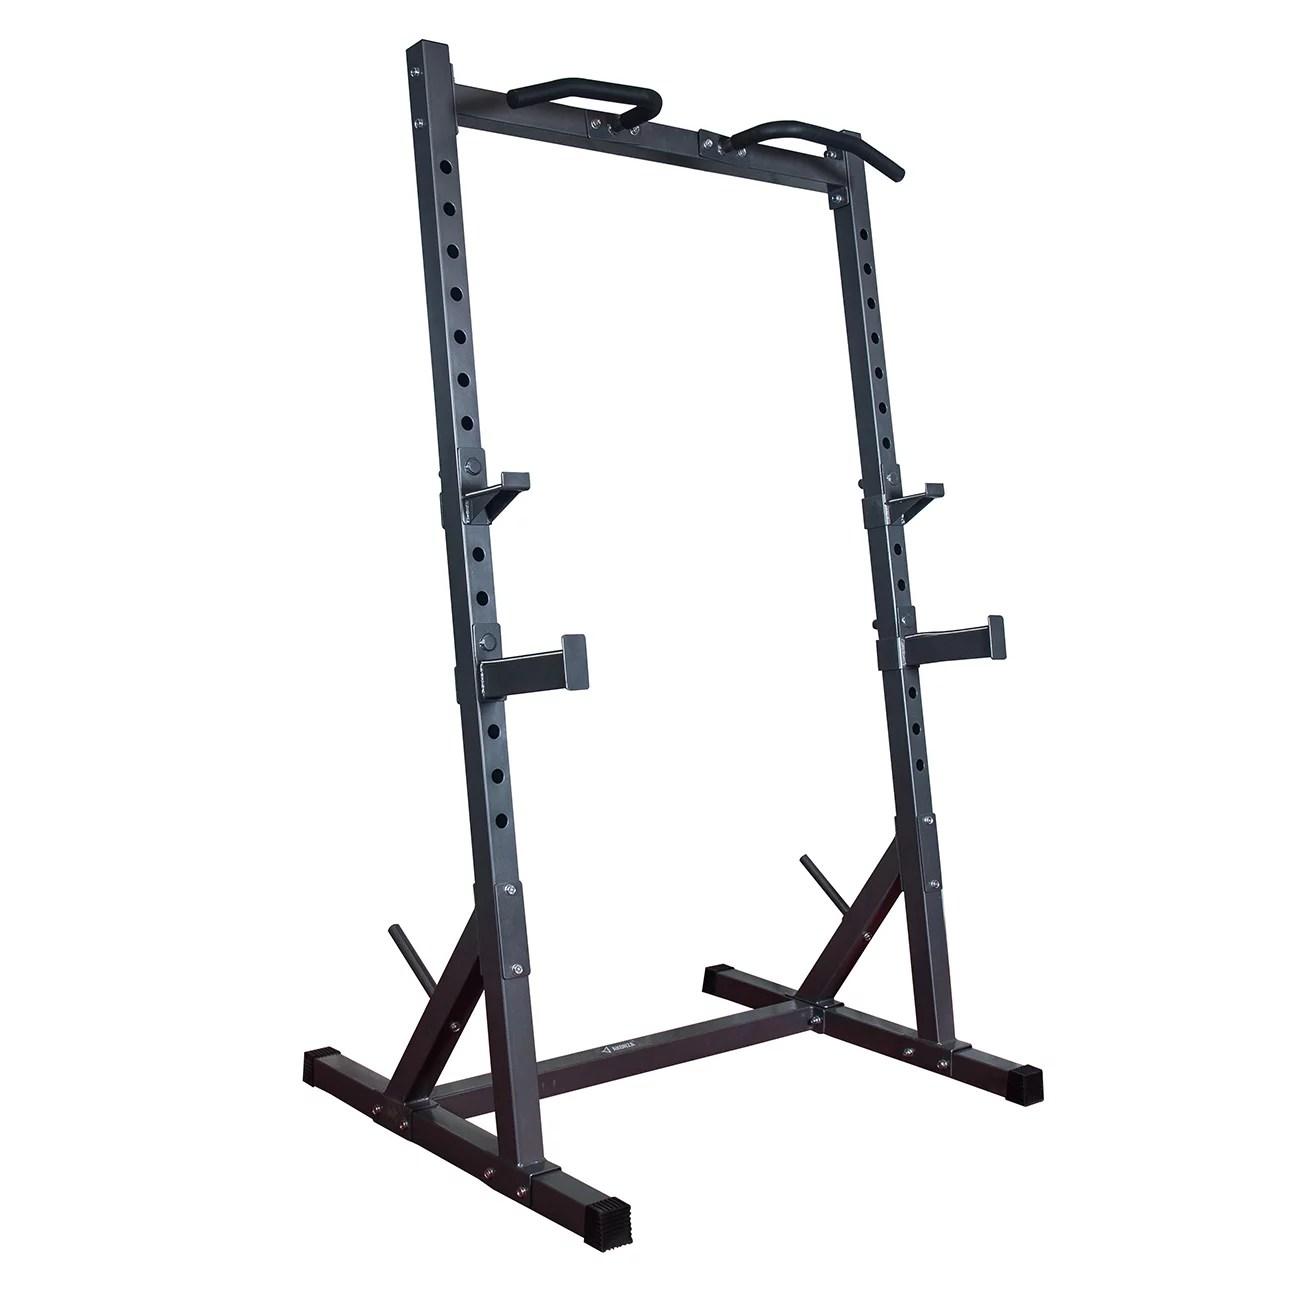 AKONZA Multi Function Squat Rack Gym Weight Lifting